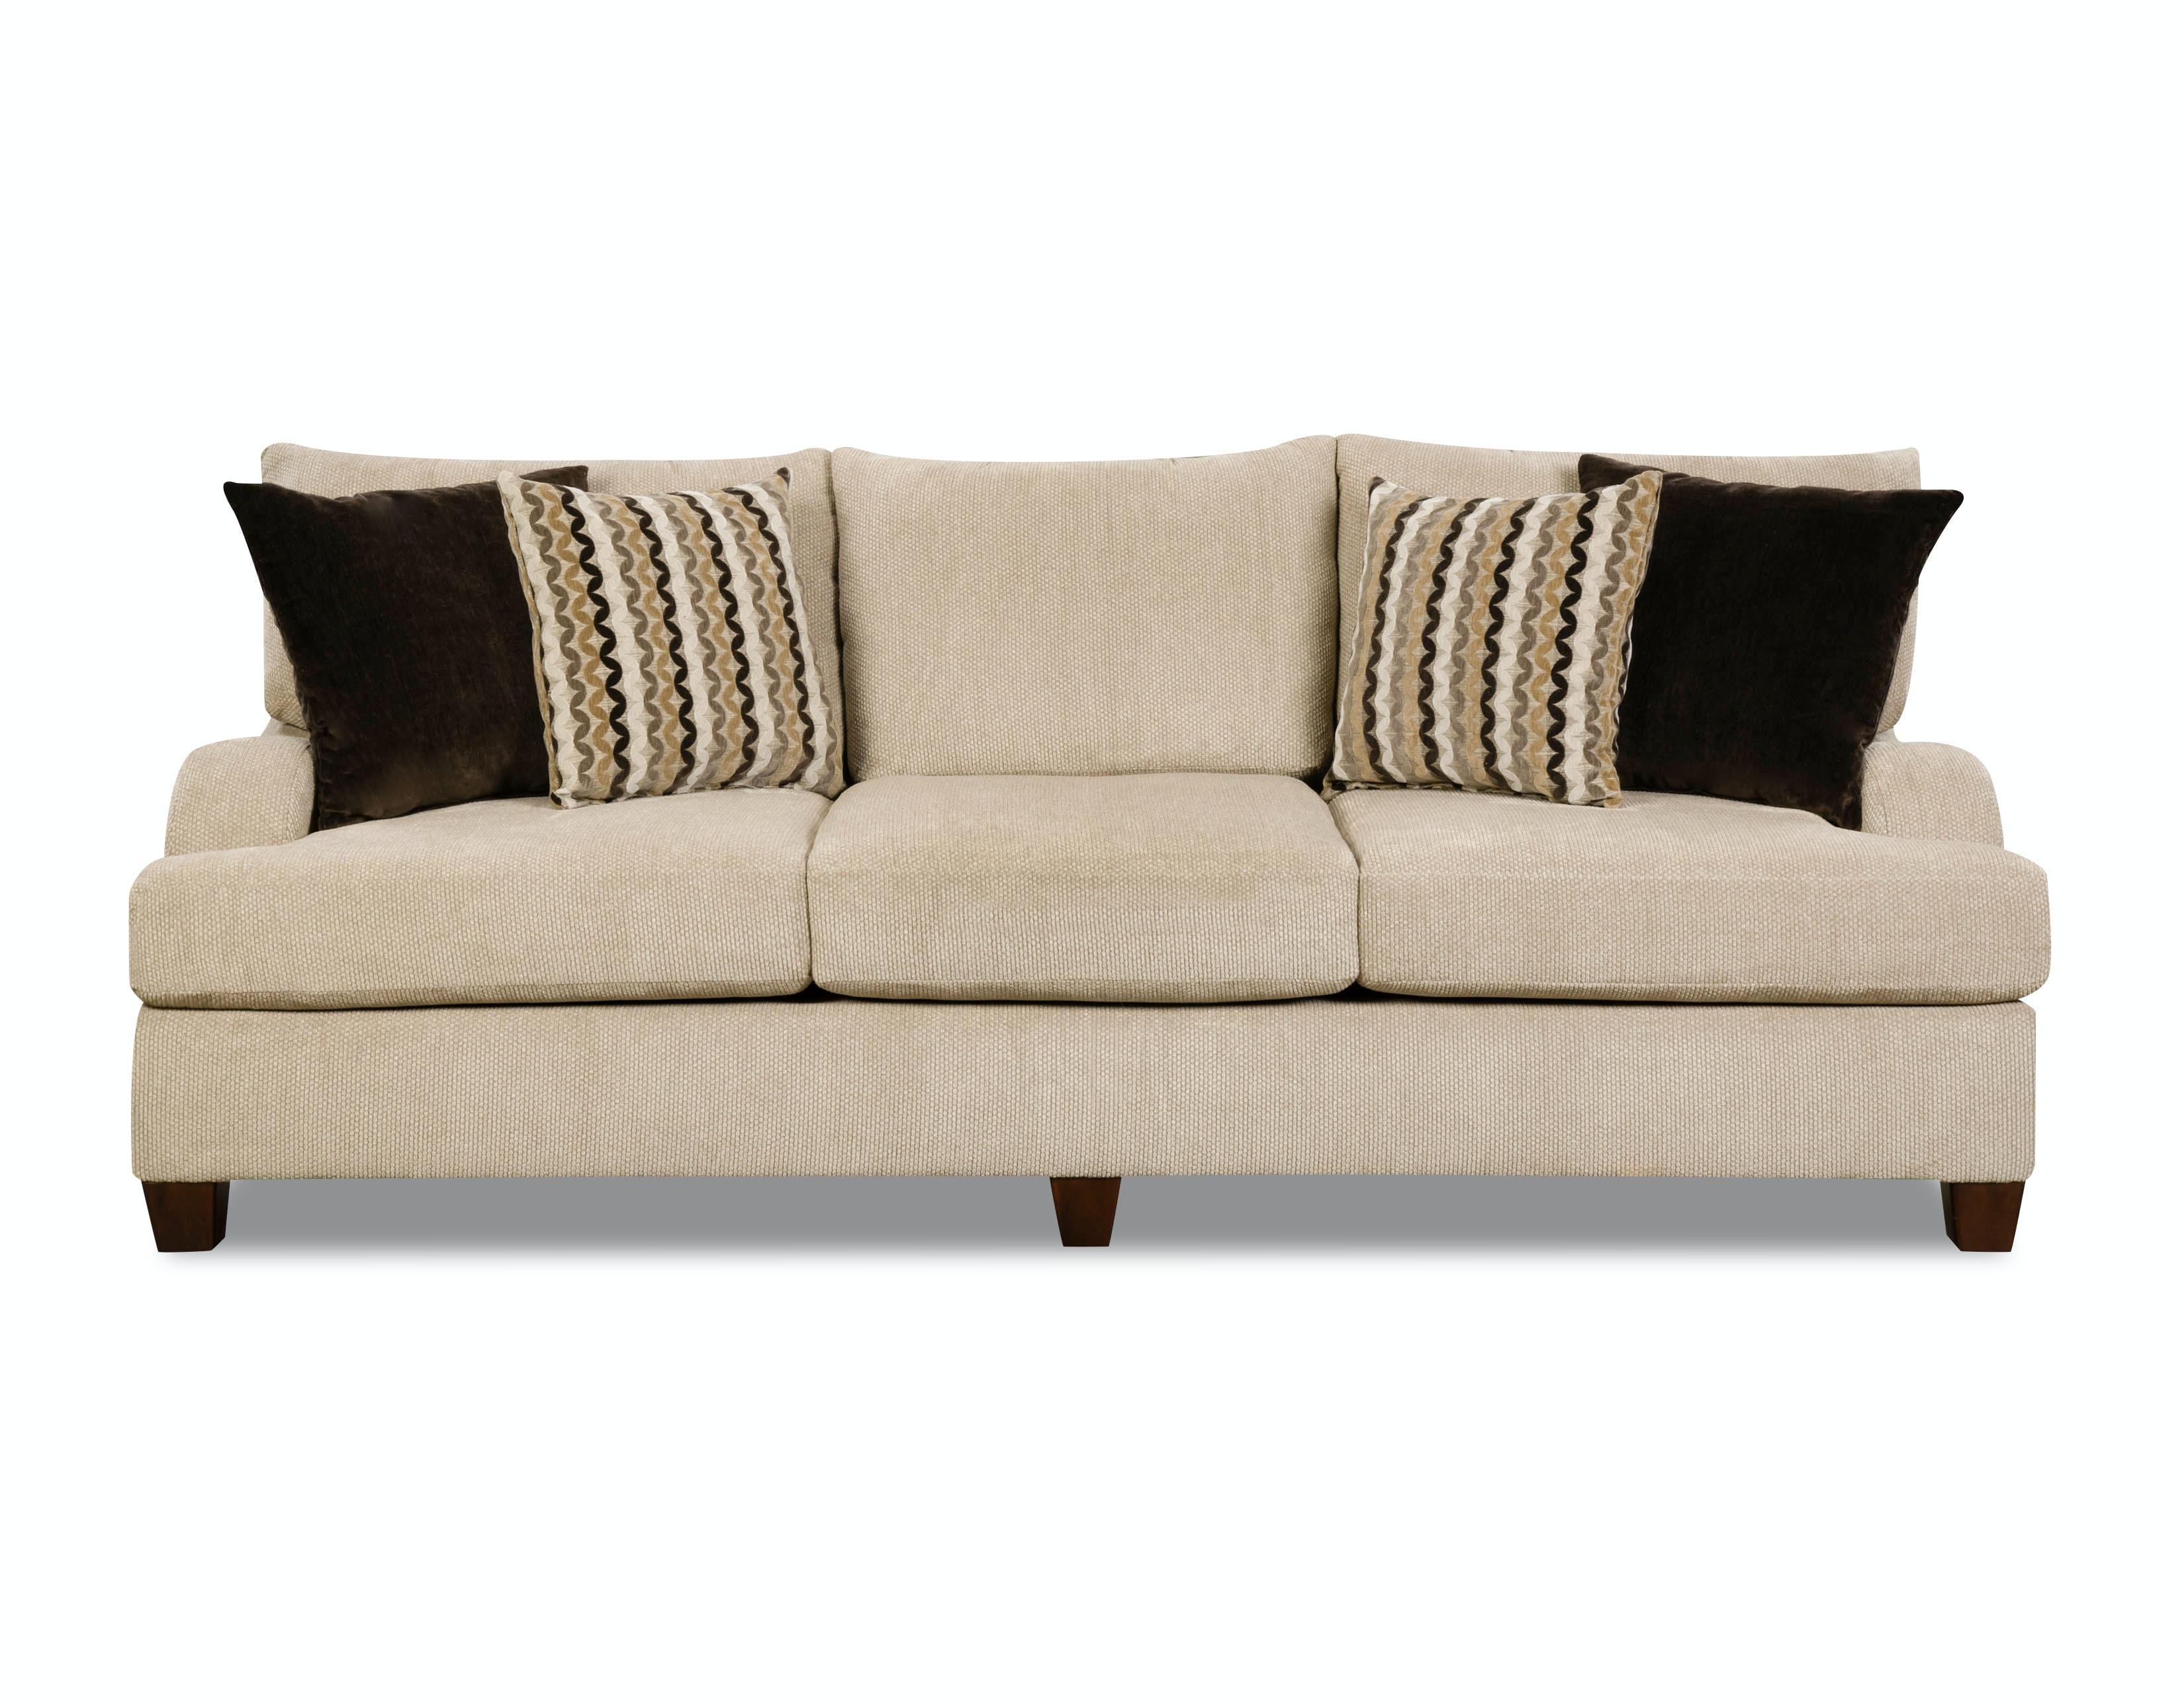 Simmons Upholstery U0026 Casegoods Living Room Sofa